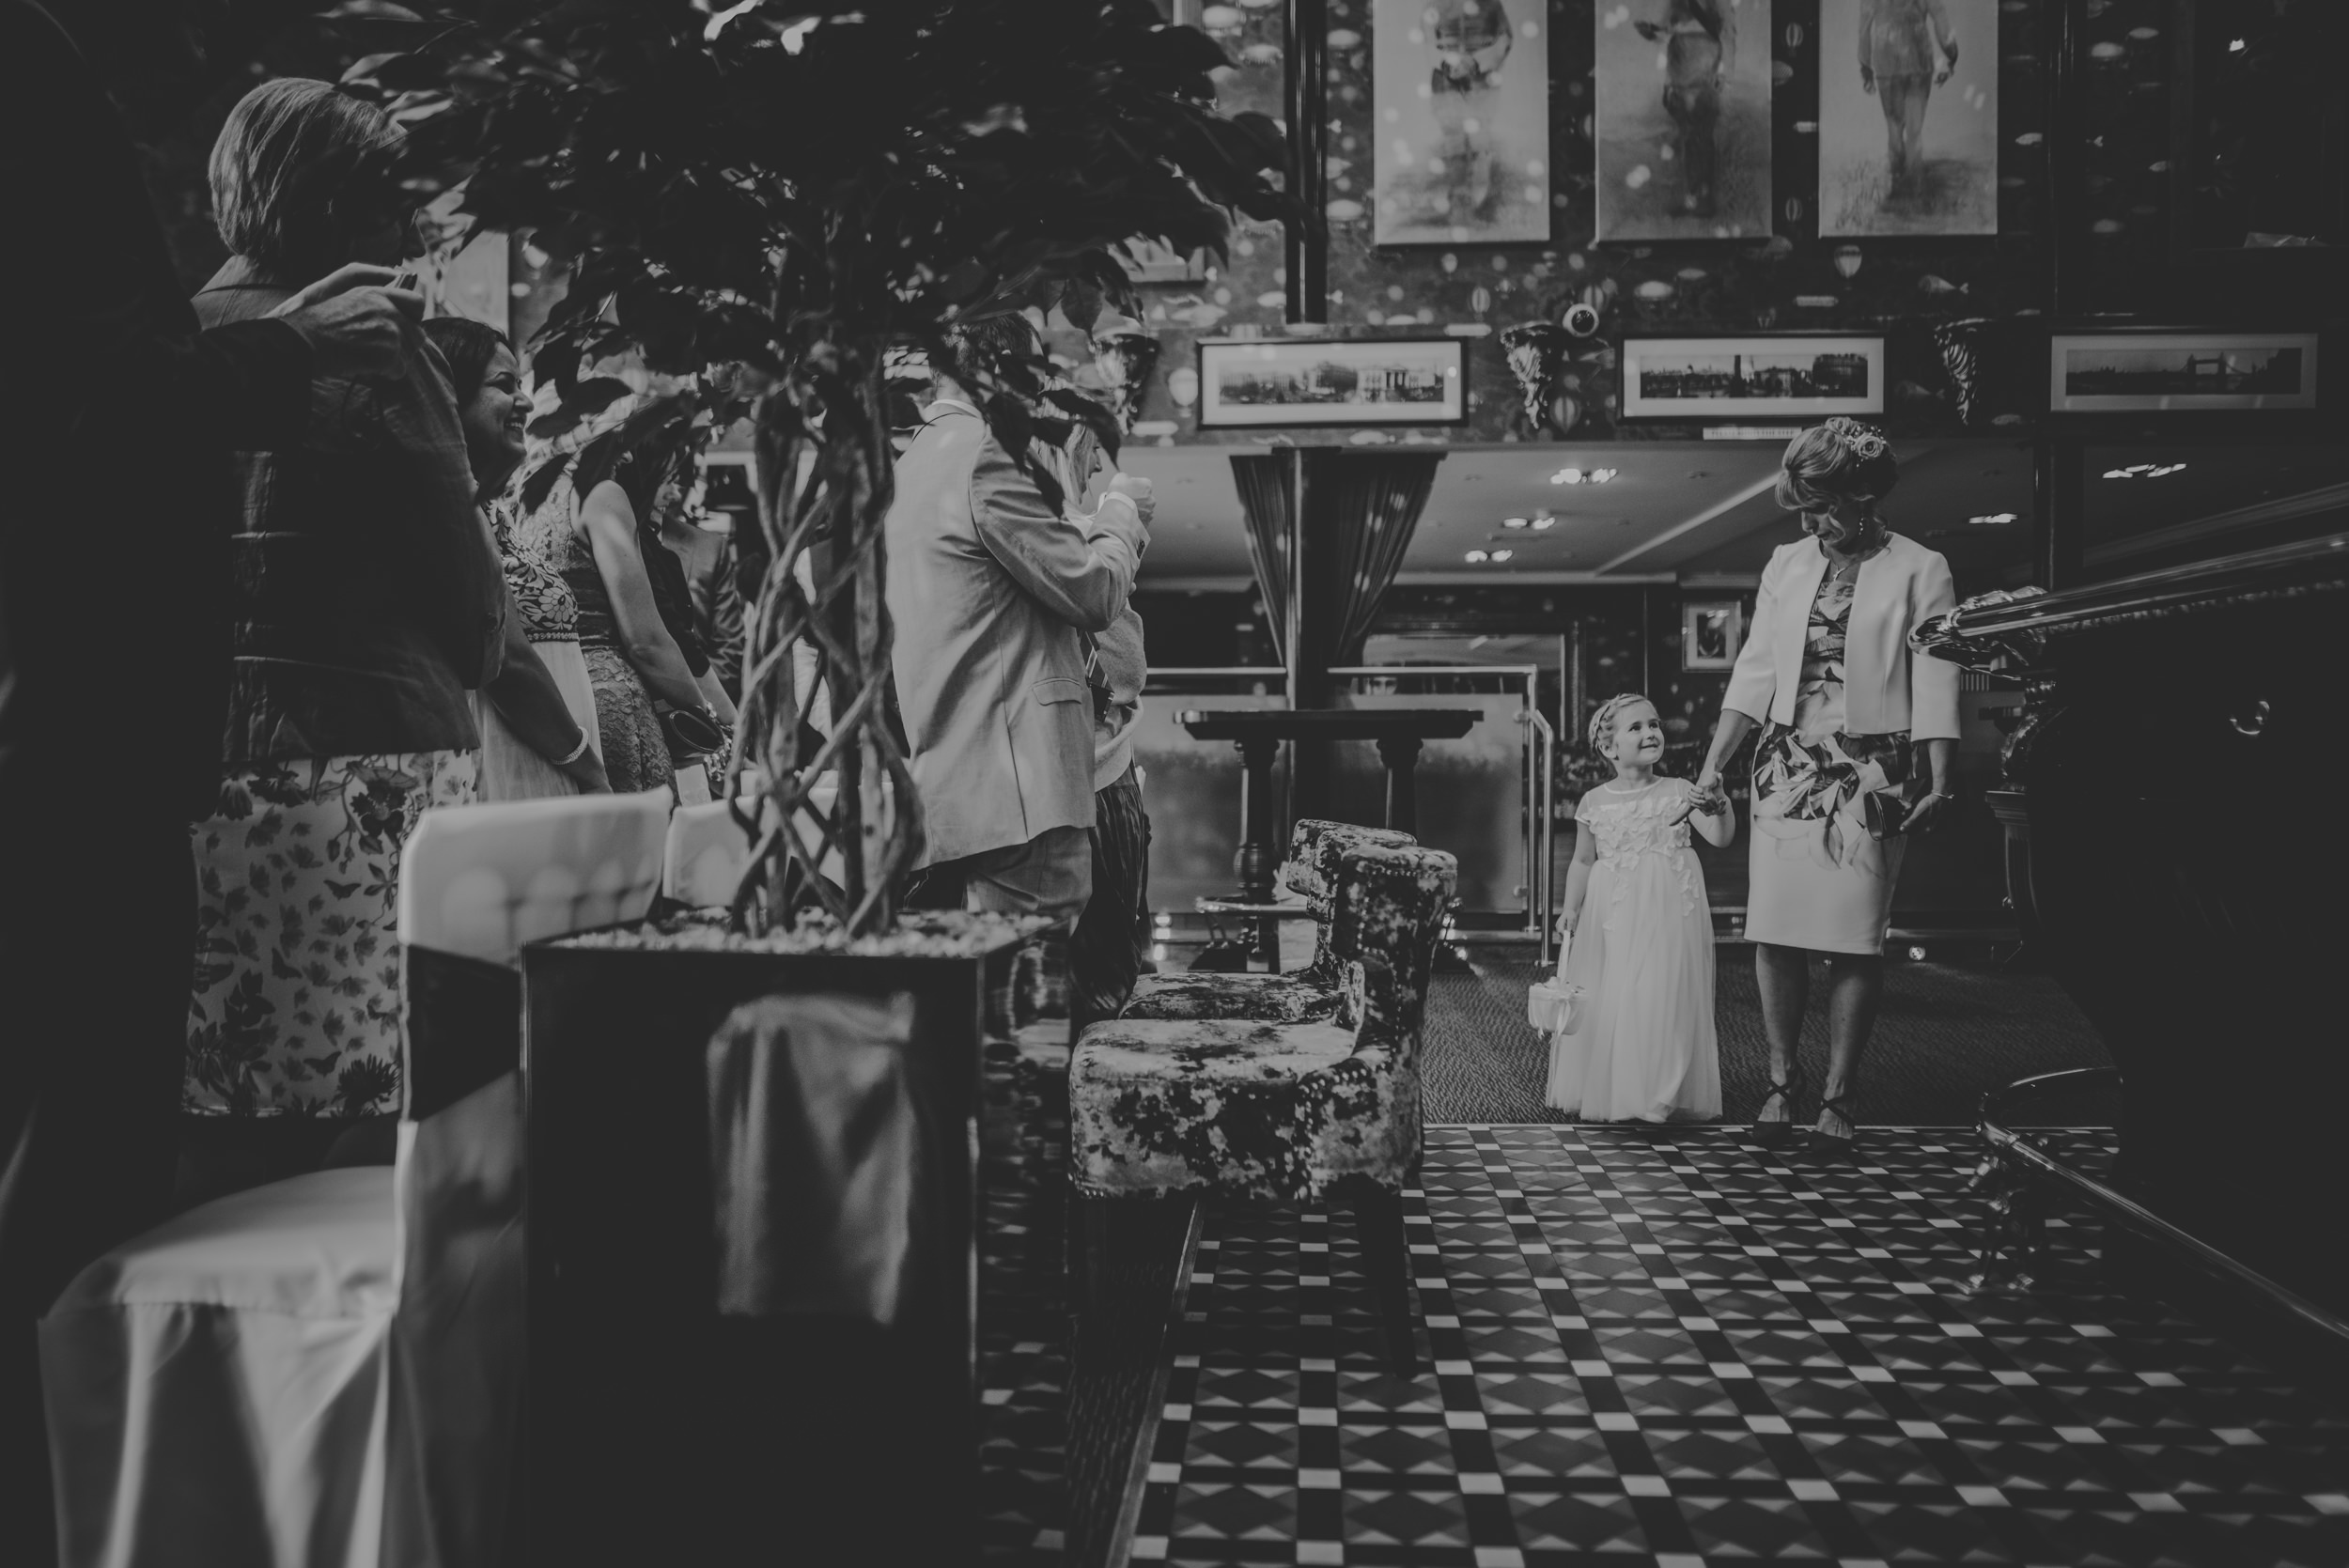 Chantelle-and-Stephen-Old-Thorns-Hotel-Wedding-Liphook-Manu-Mendoza-Wedding-Photography-166.jpg